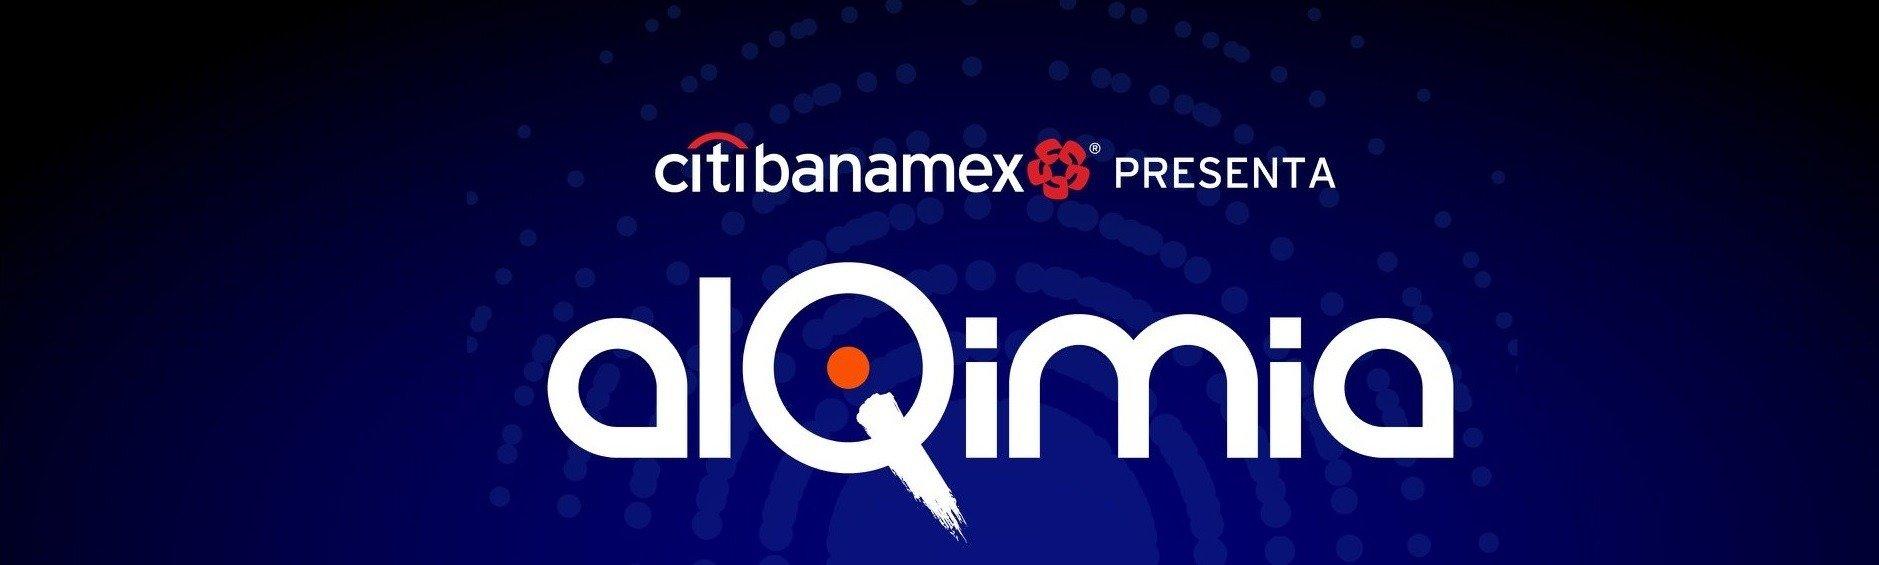 Citibanamex Presenta alQimia